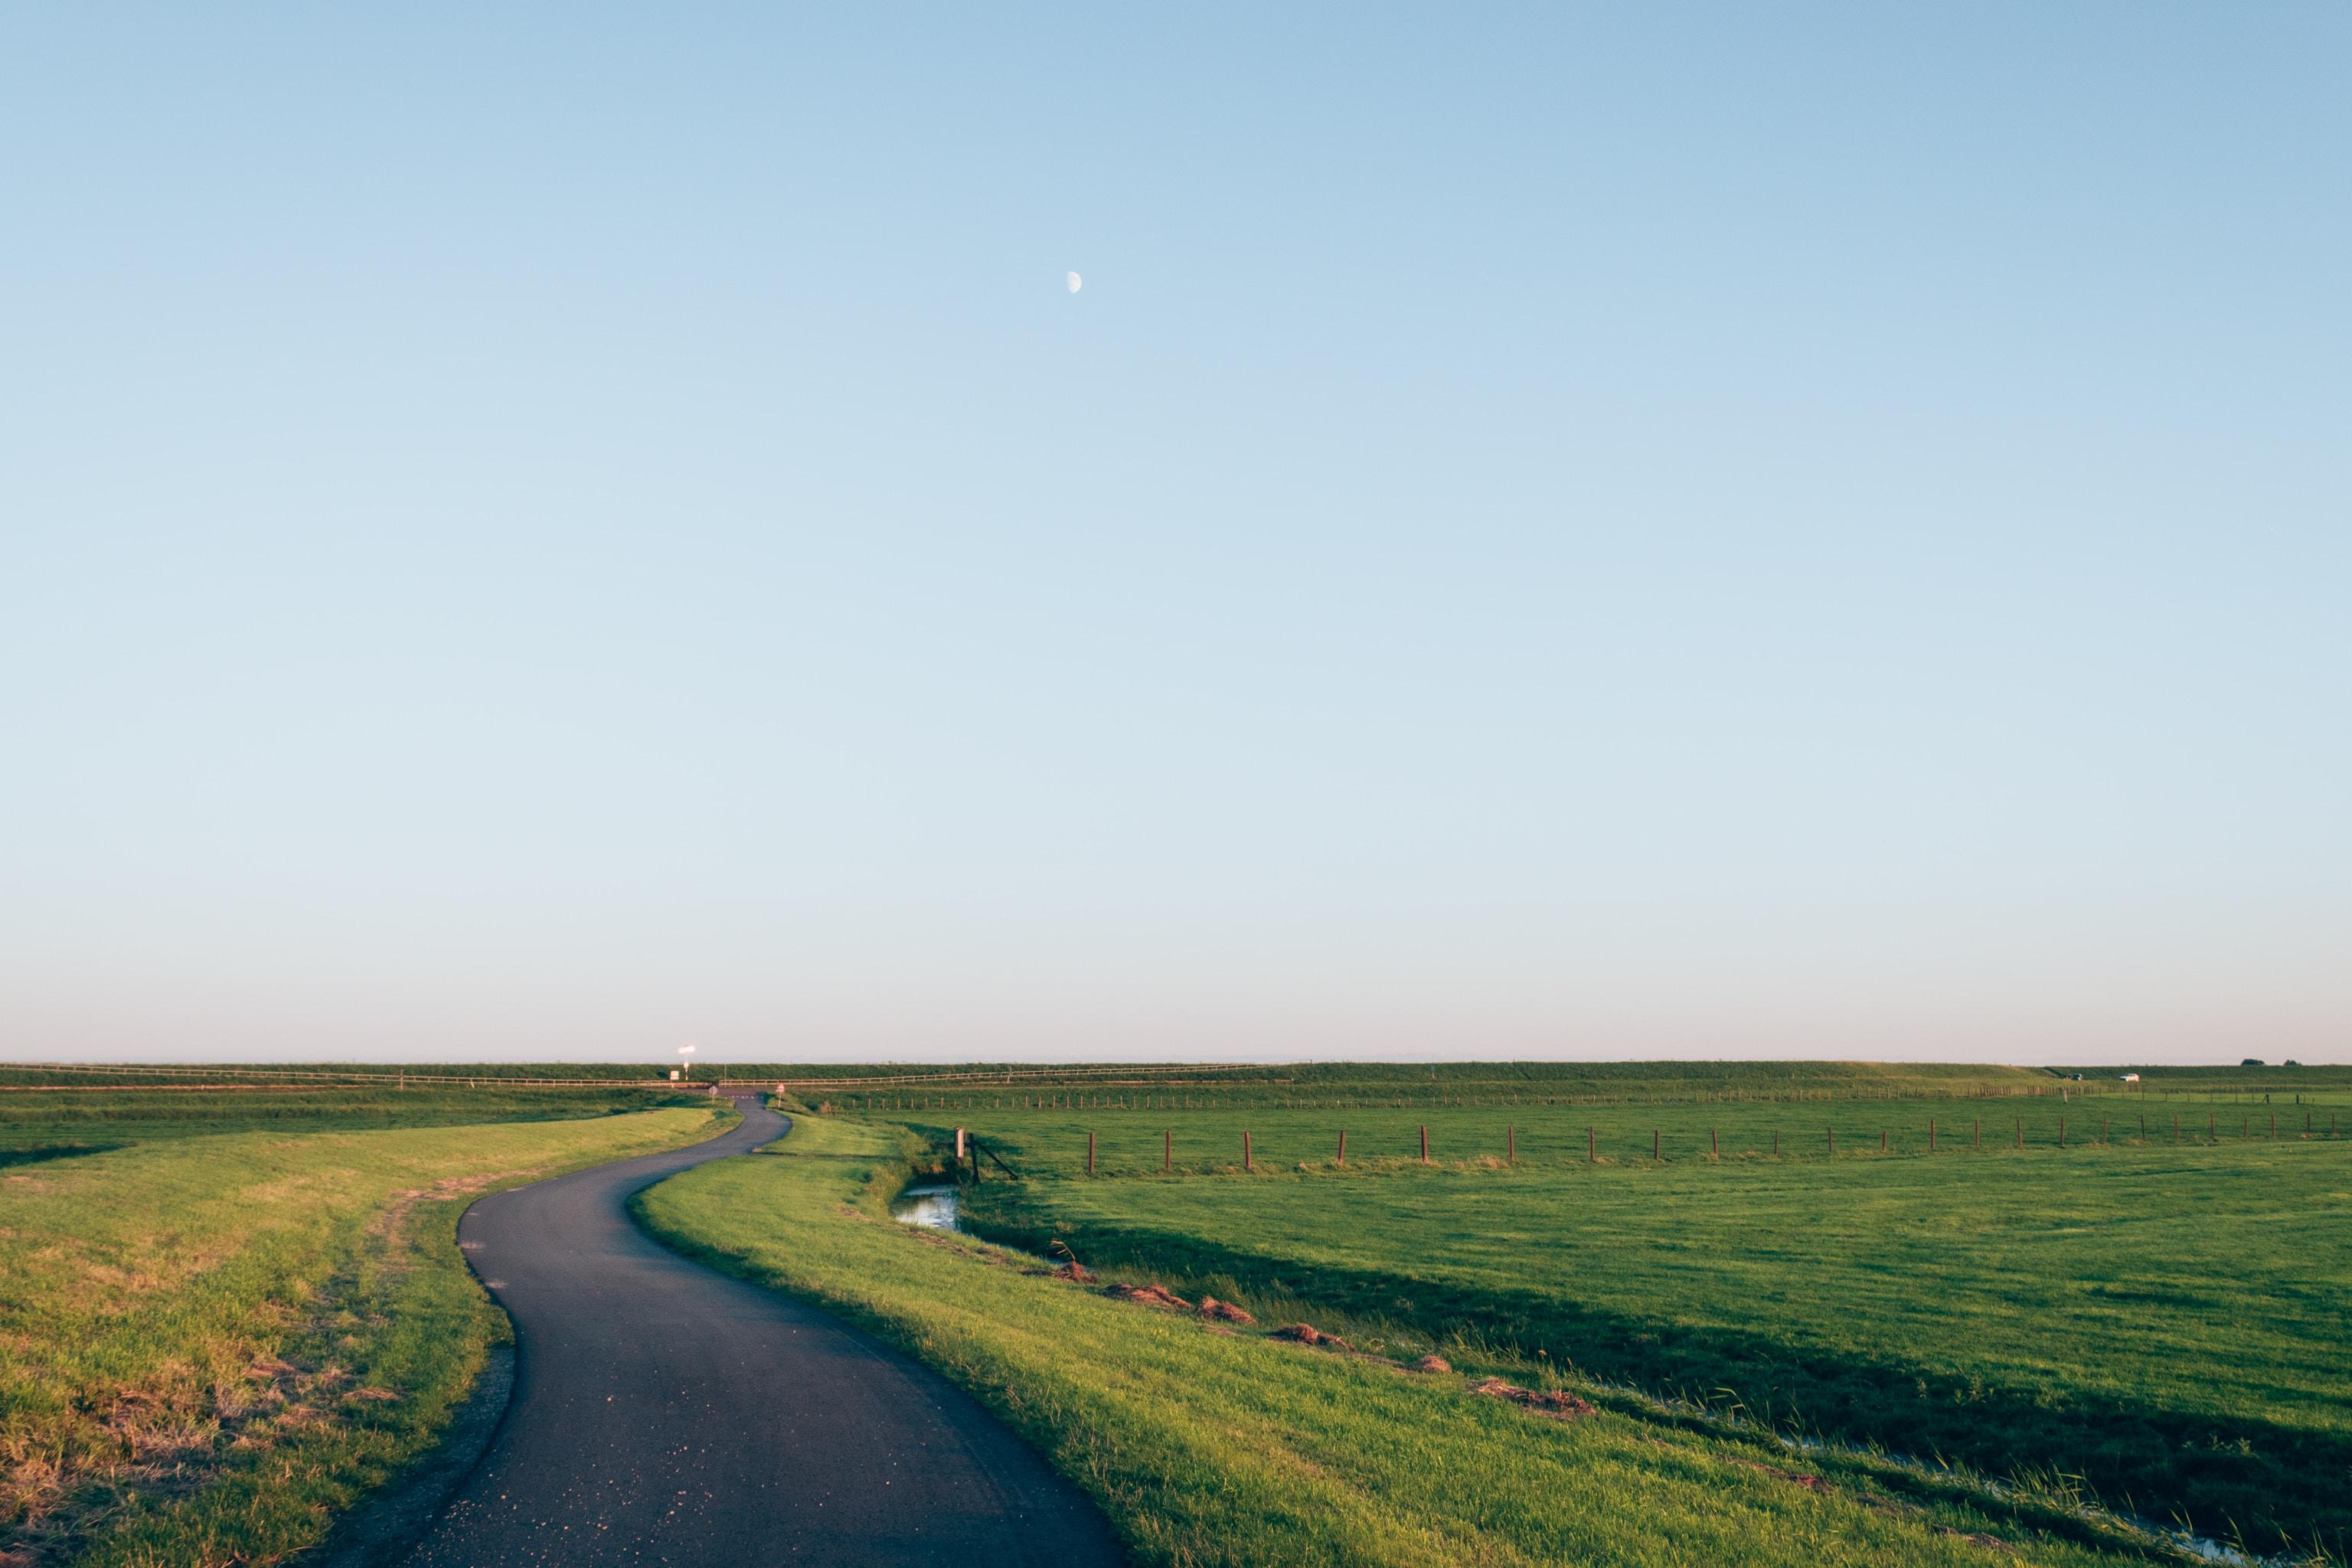 A winding road through a green meadow